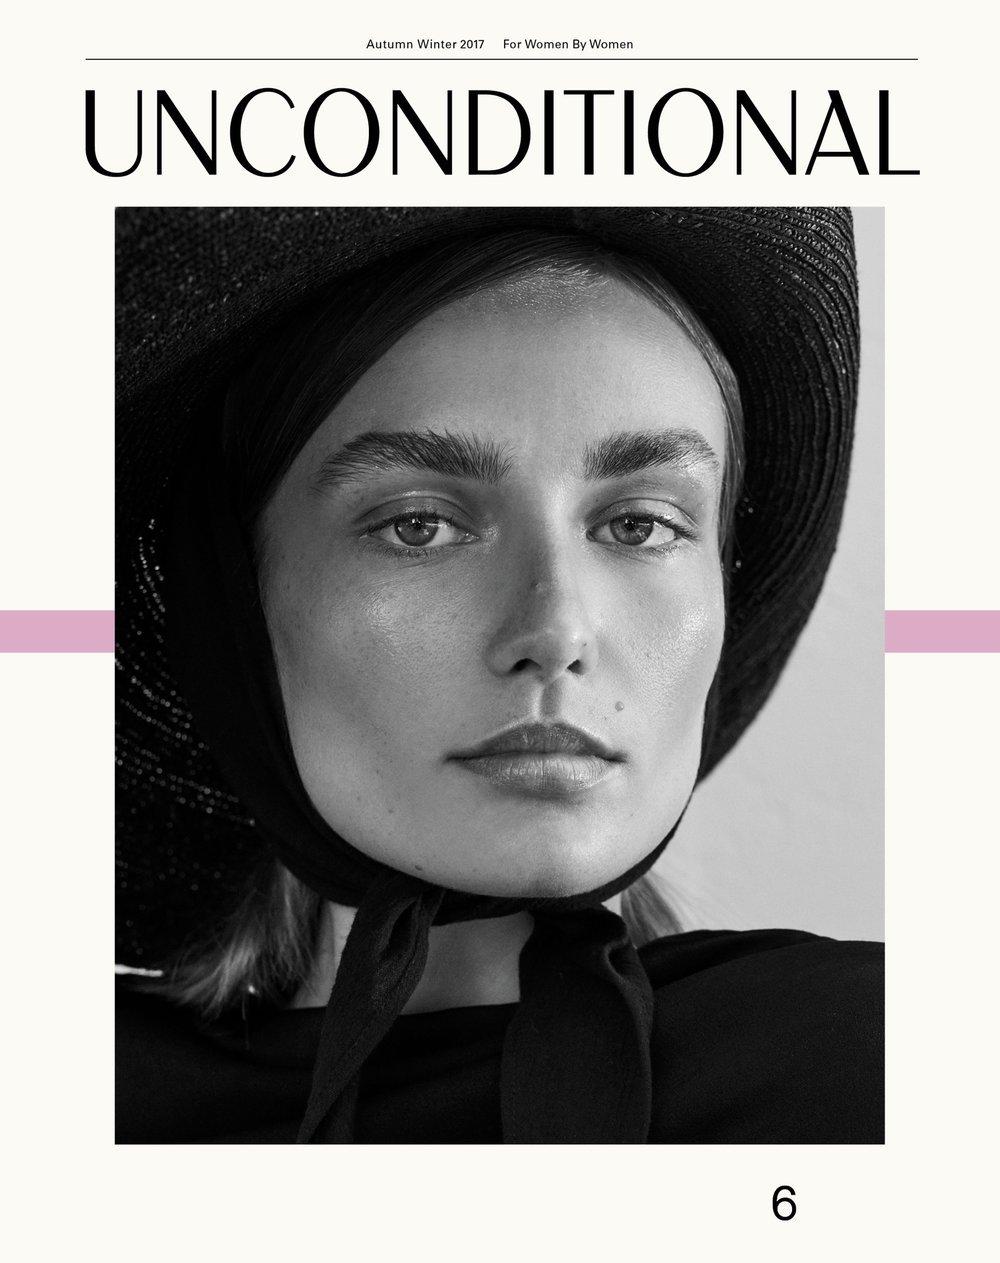 Unconditional Magazine Cover